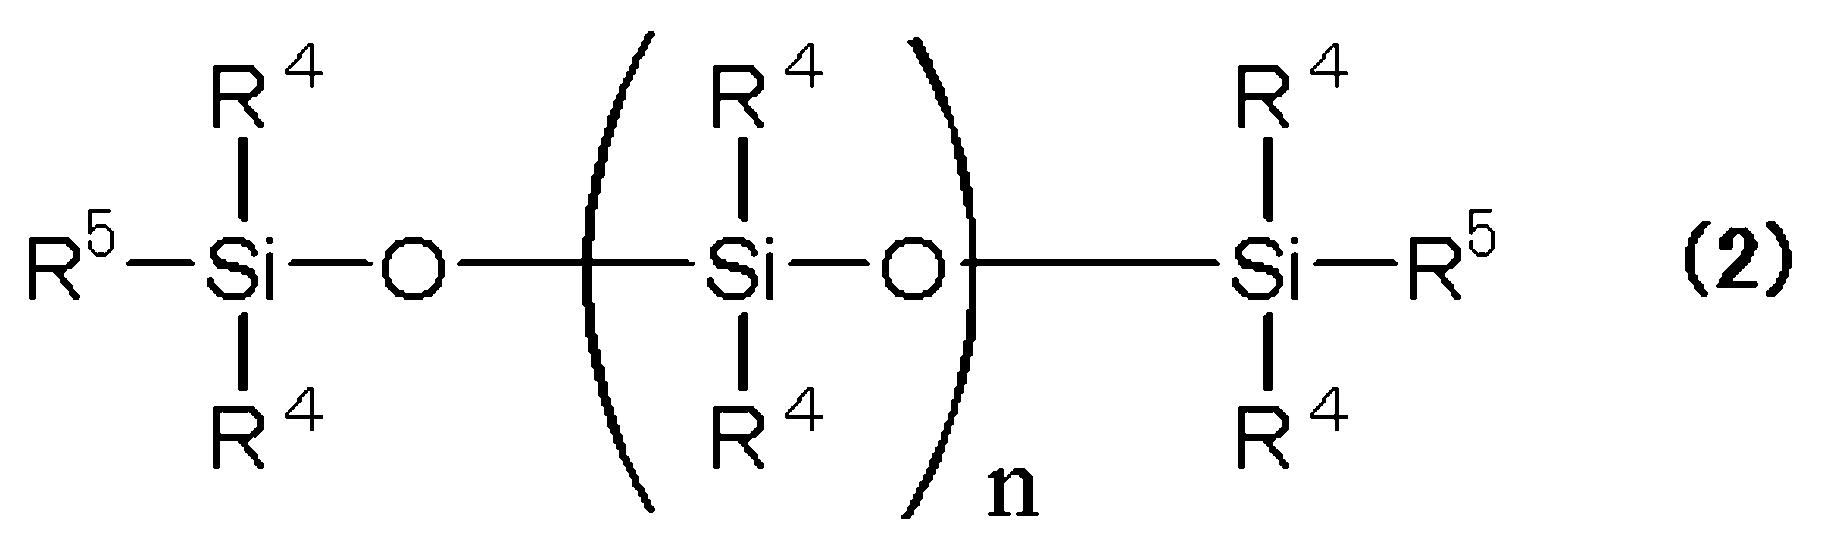 Figure 112013032283310-pat00002